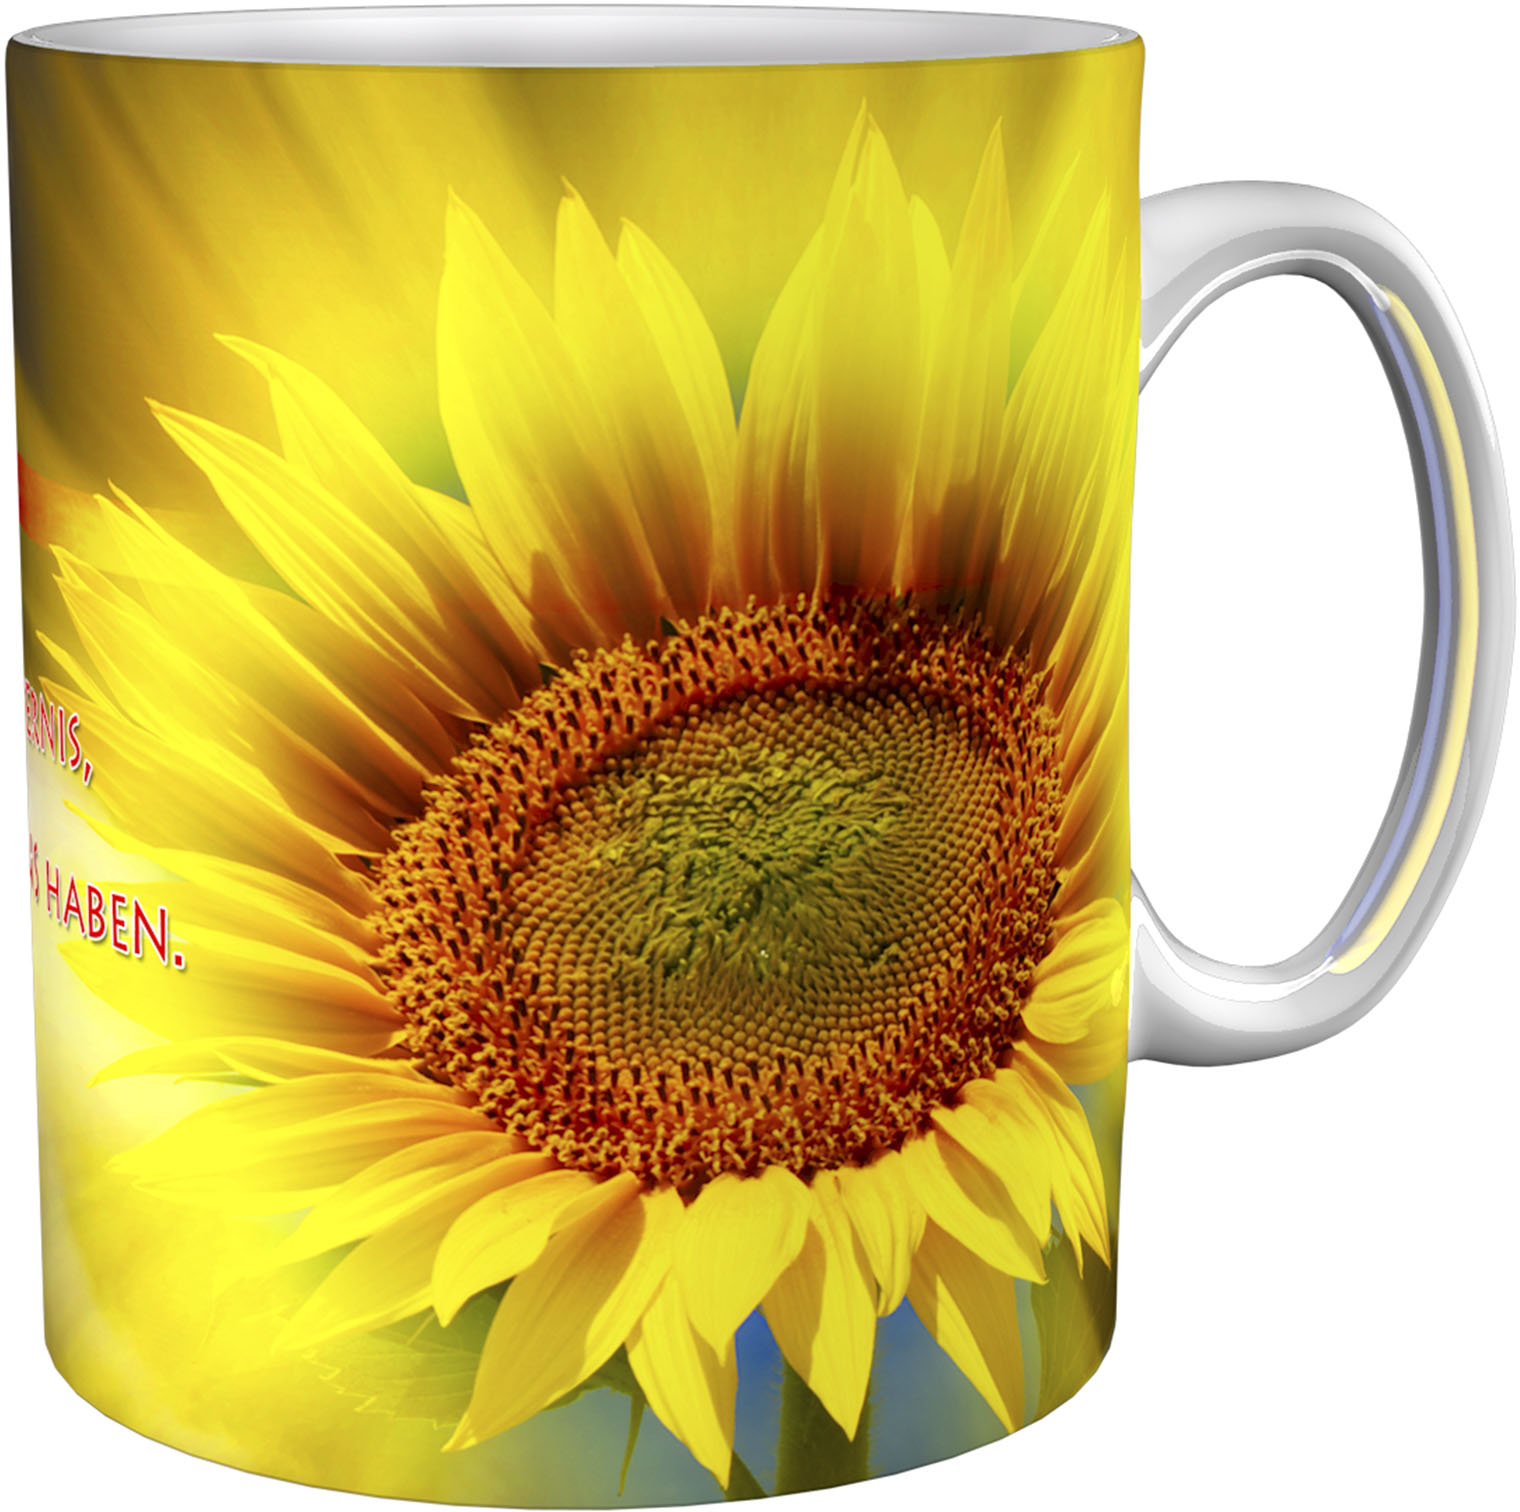 Kaffeetasse / Kaffeebecher / Sonnenblume / Christlich